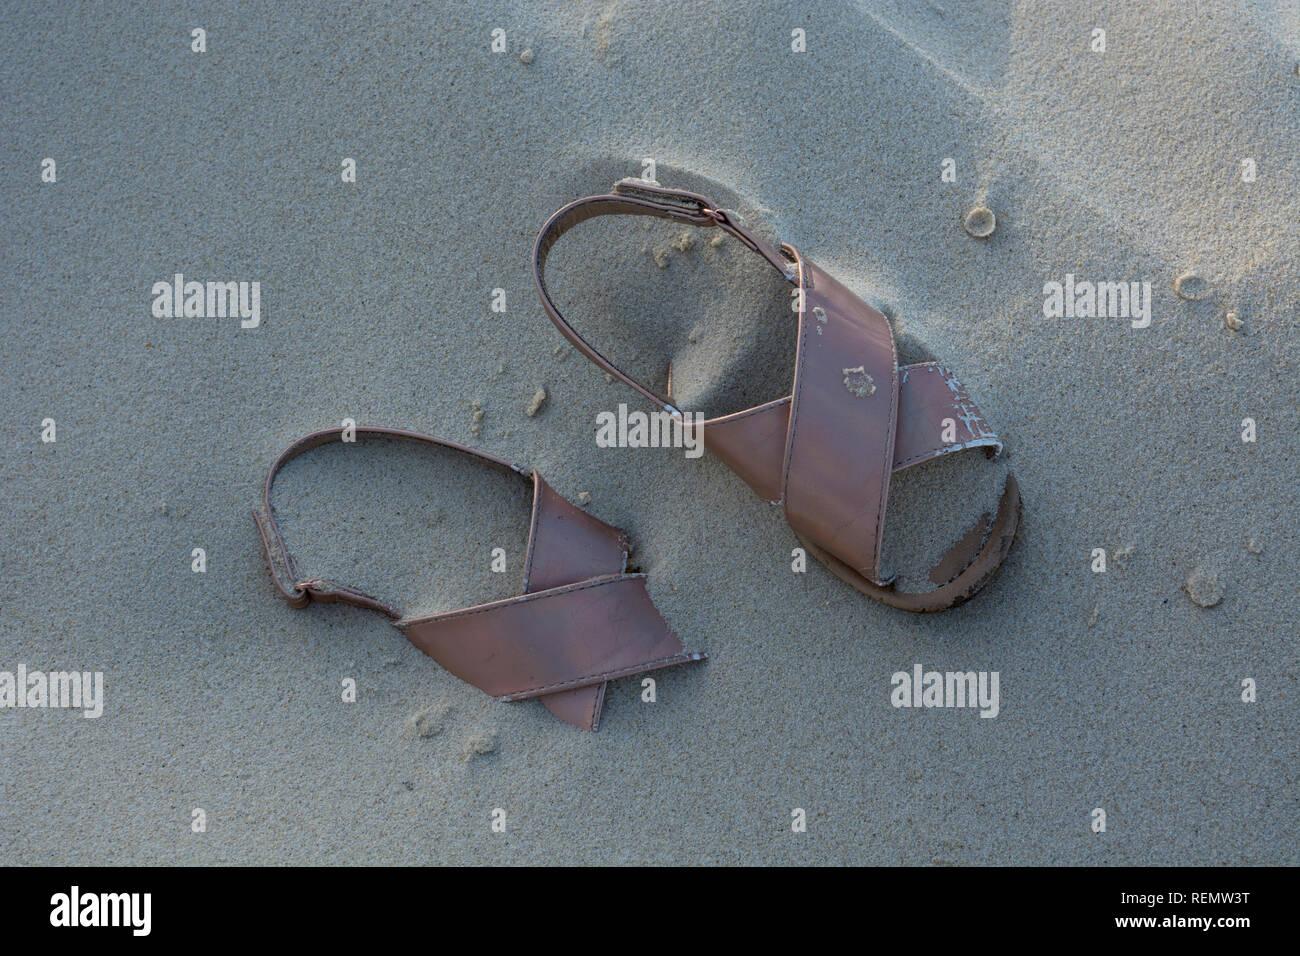 fa23bba812984d Sandals Beach Sand Womens Stock Photos & Sandals Beach Sand Womens ...